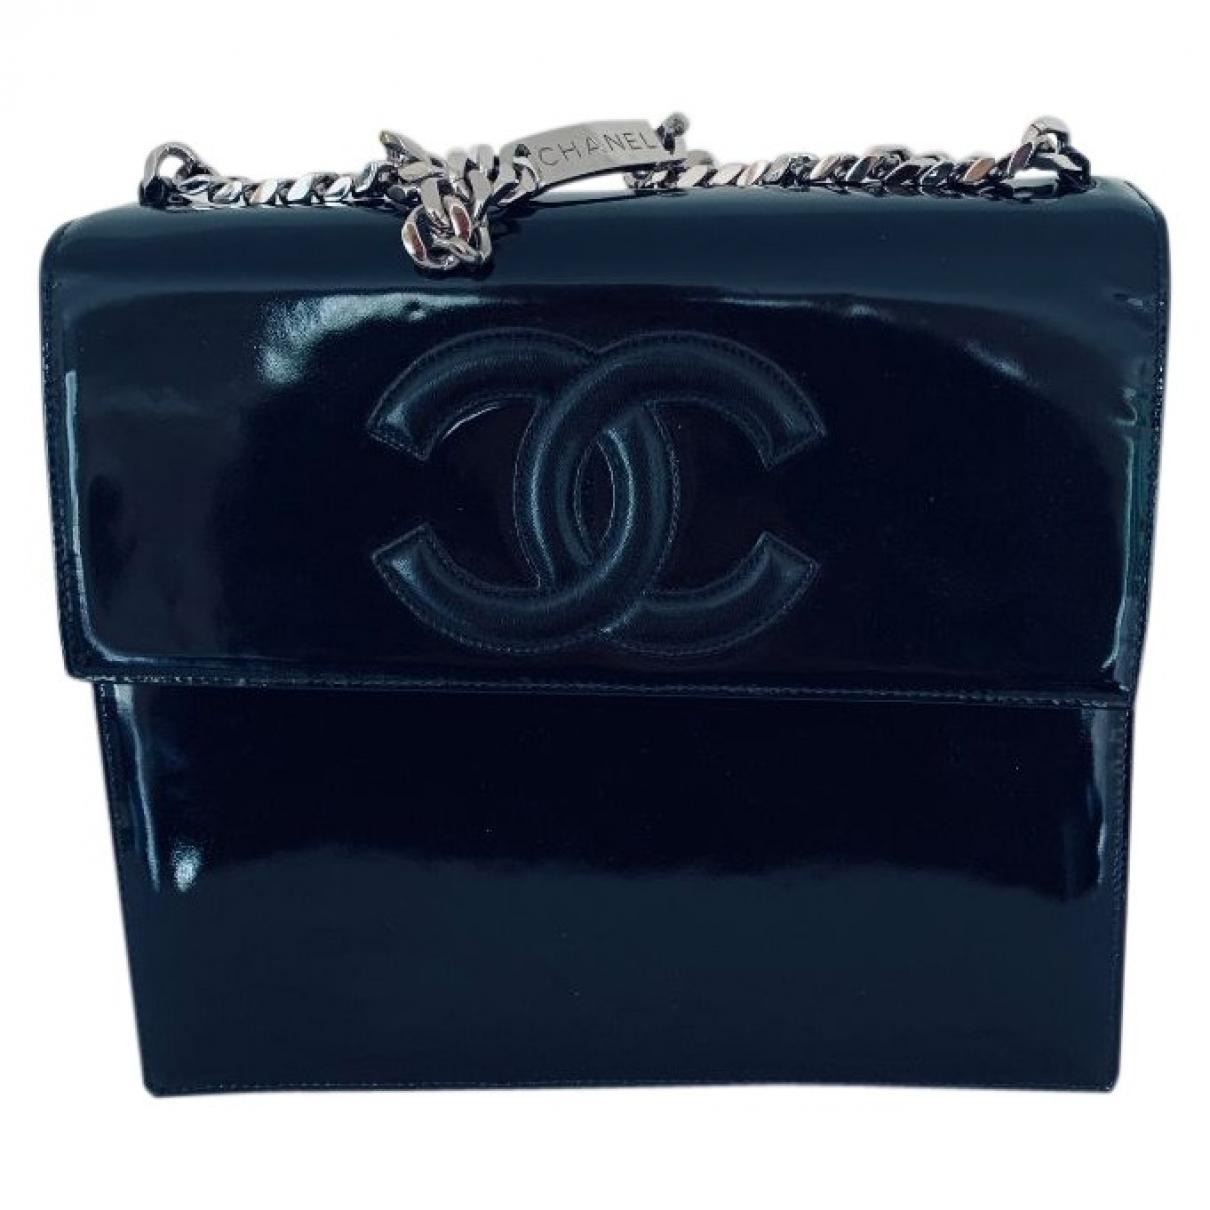 Chanel \N Black Patent leather handbag for Women \N